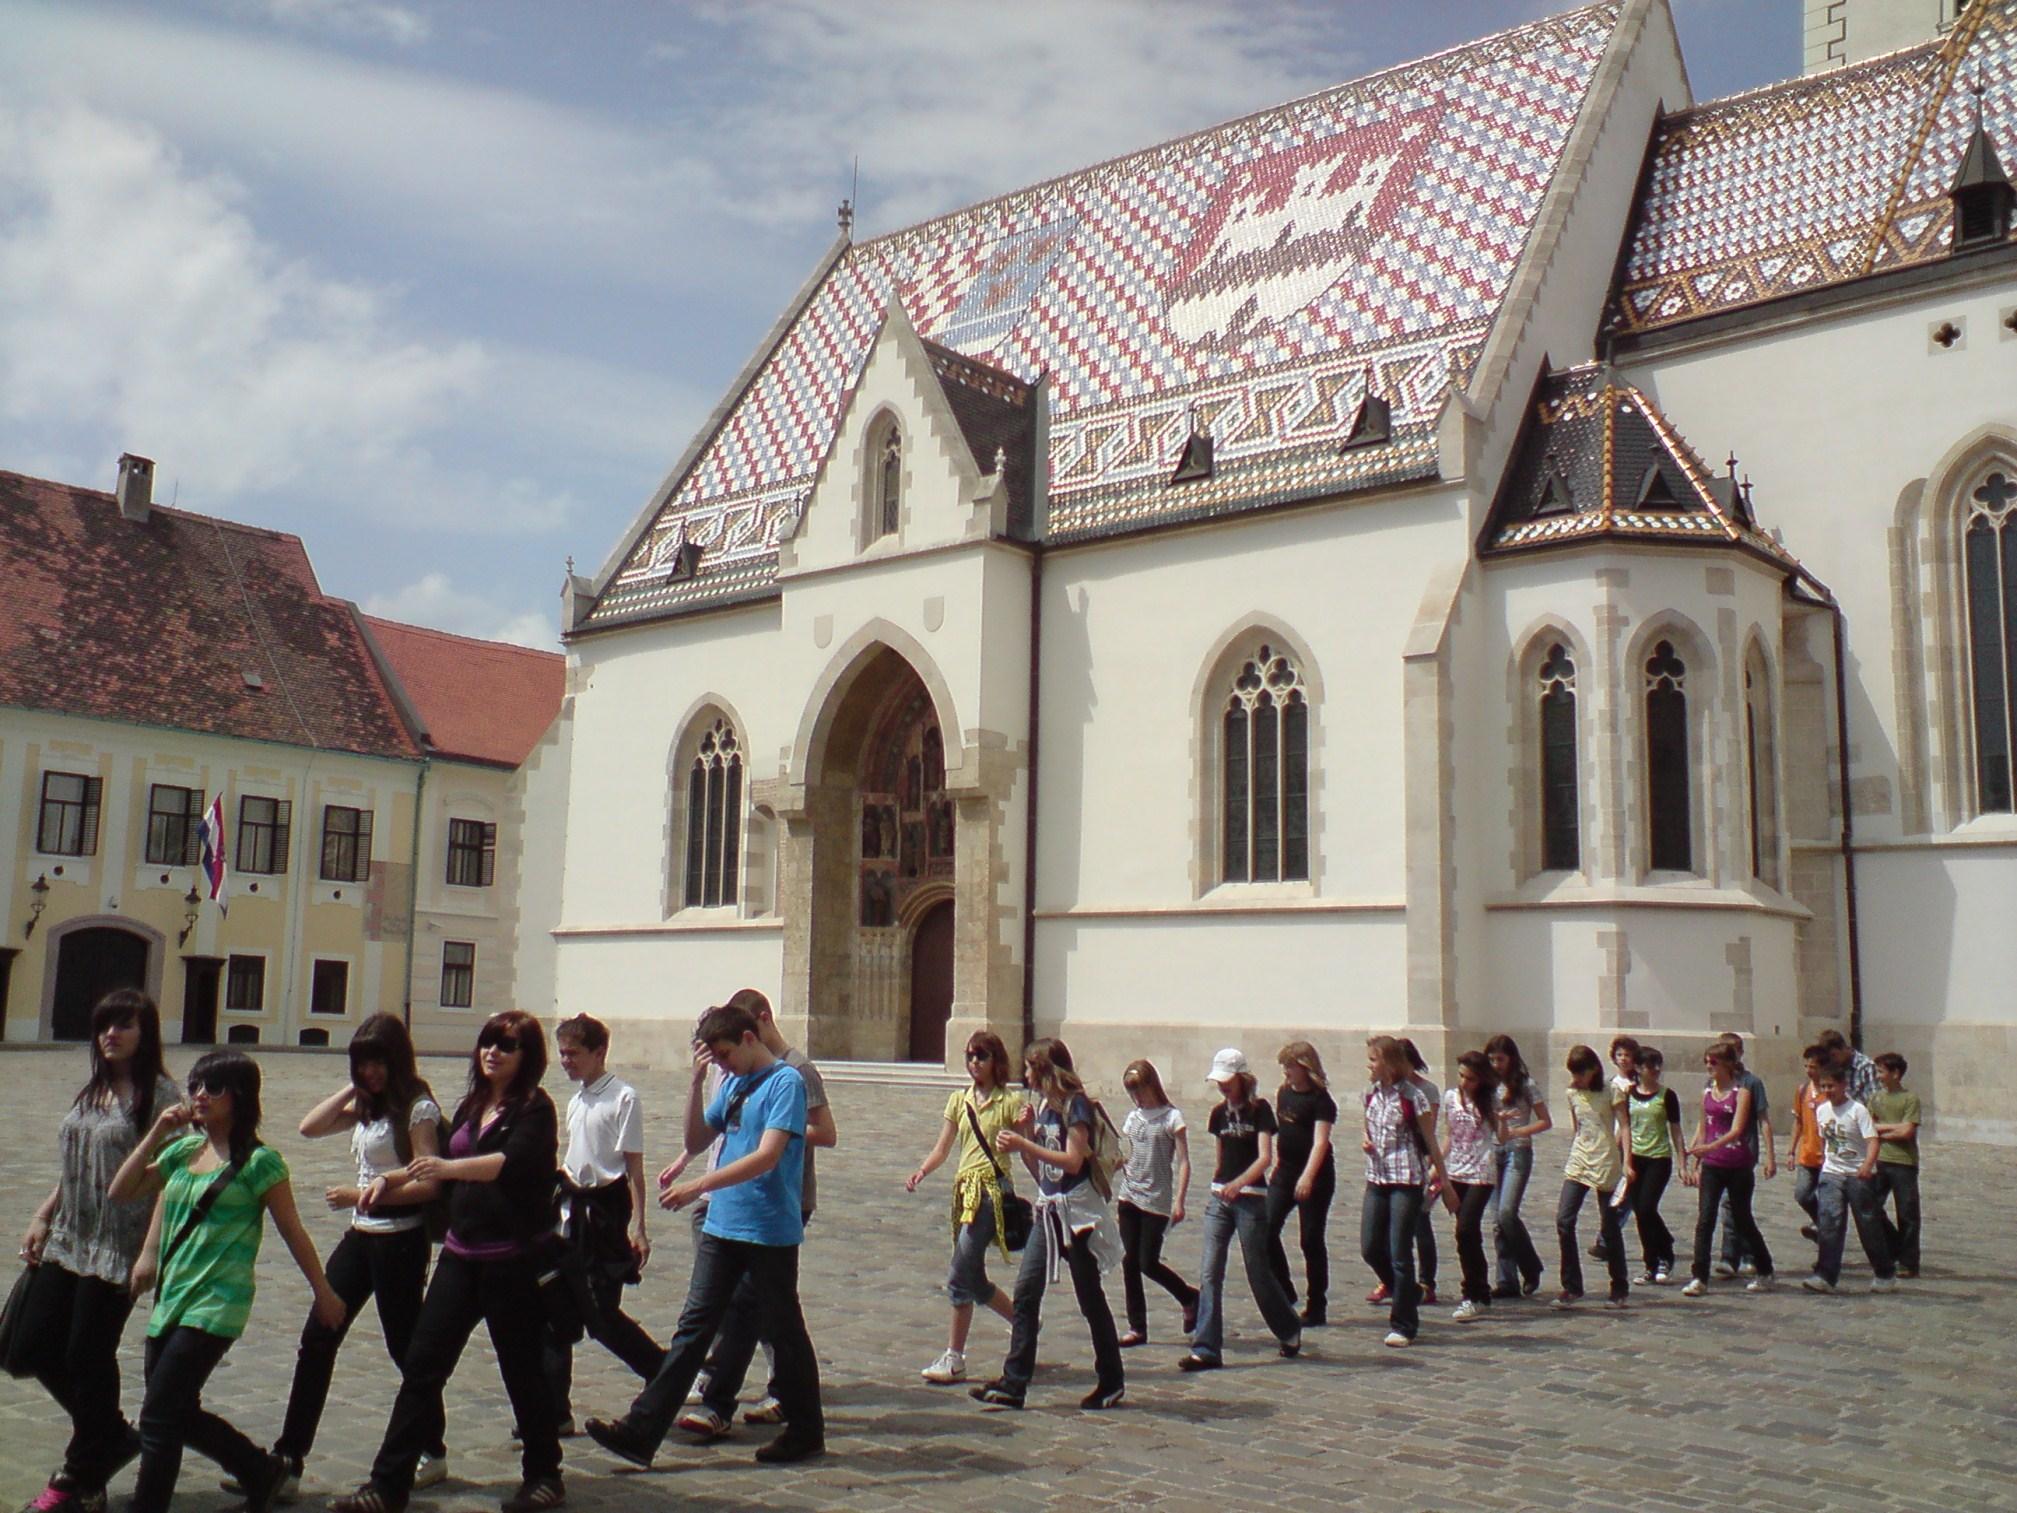 Zagreb - Opća tura: Crkva sv. Marka